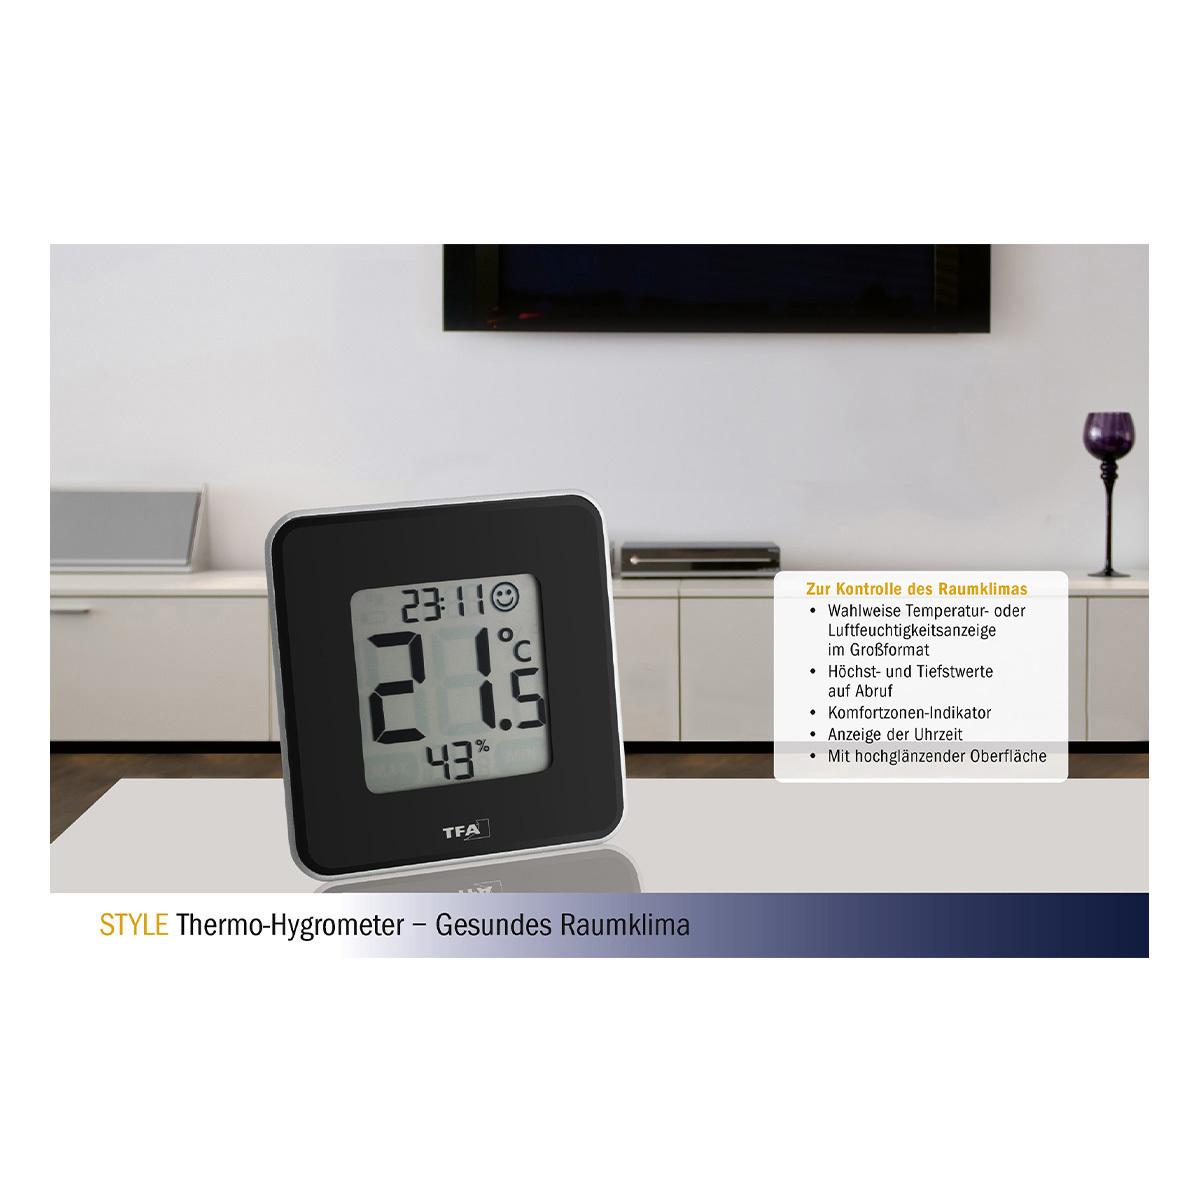 30-5021-01-digitales-thermo-hygrometer-style-vorteile-1200x1200px.jpg